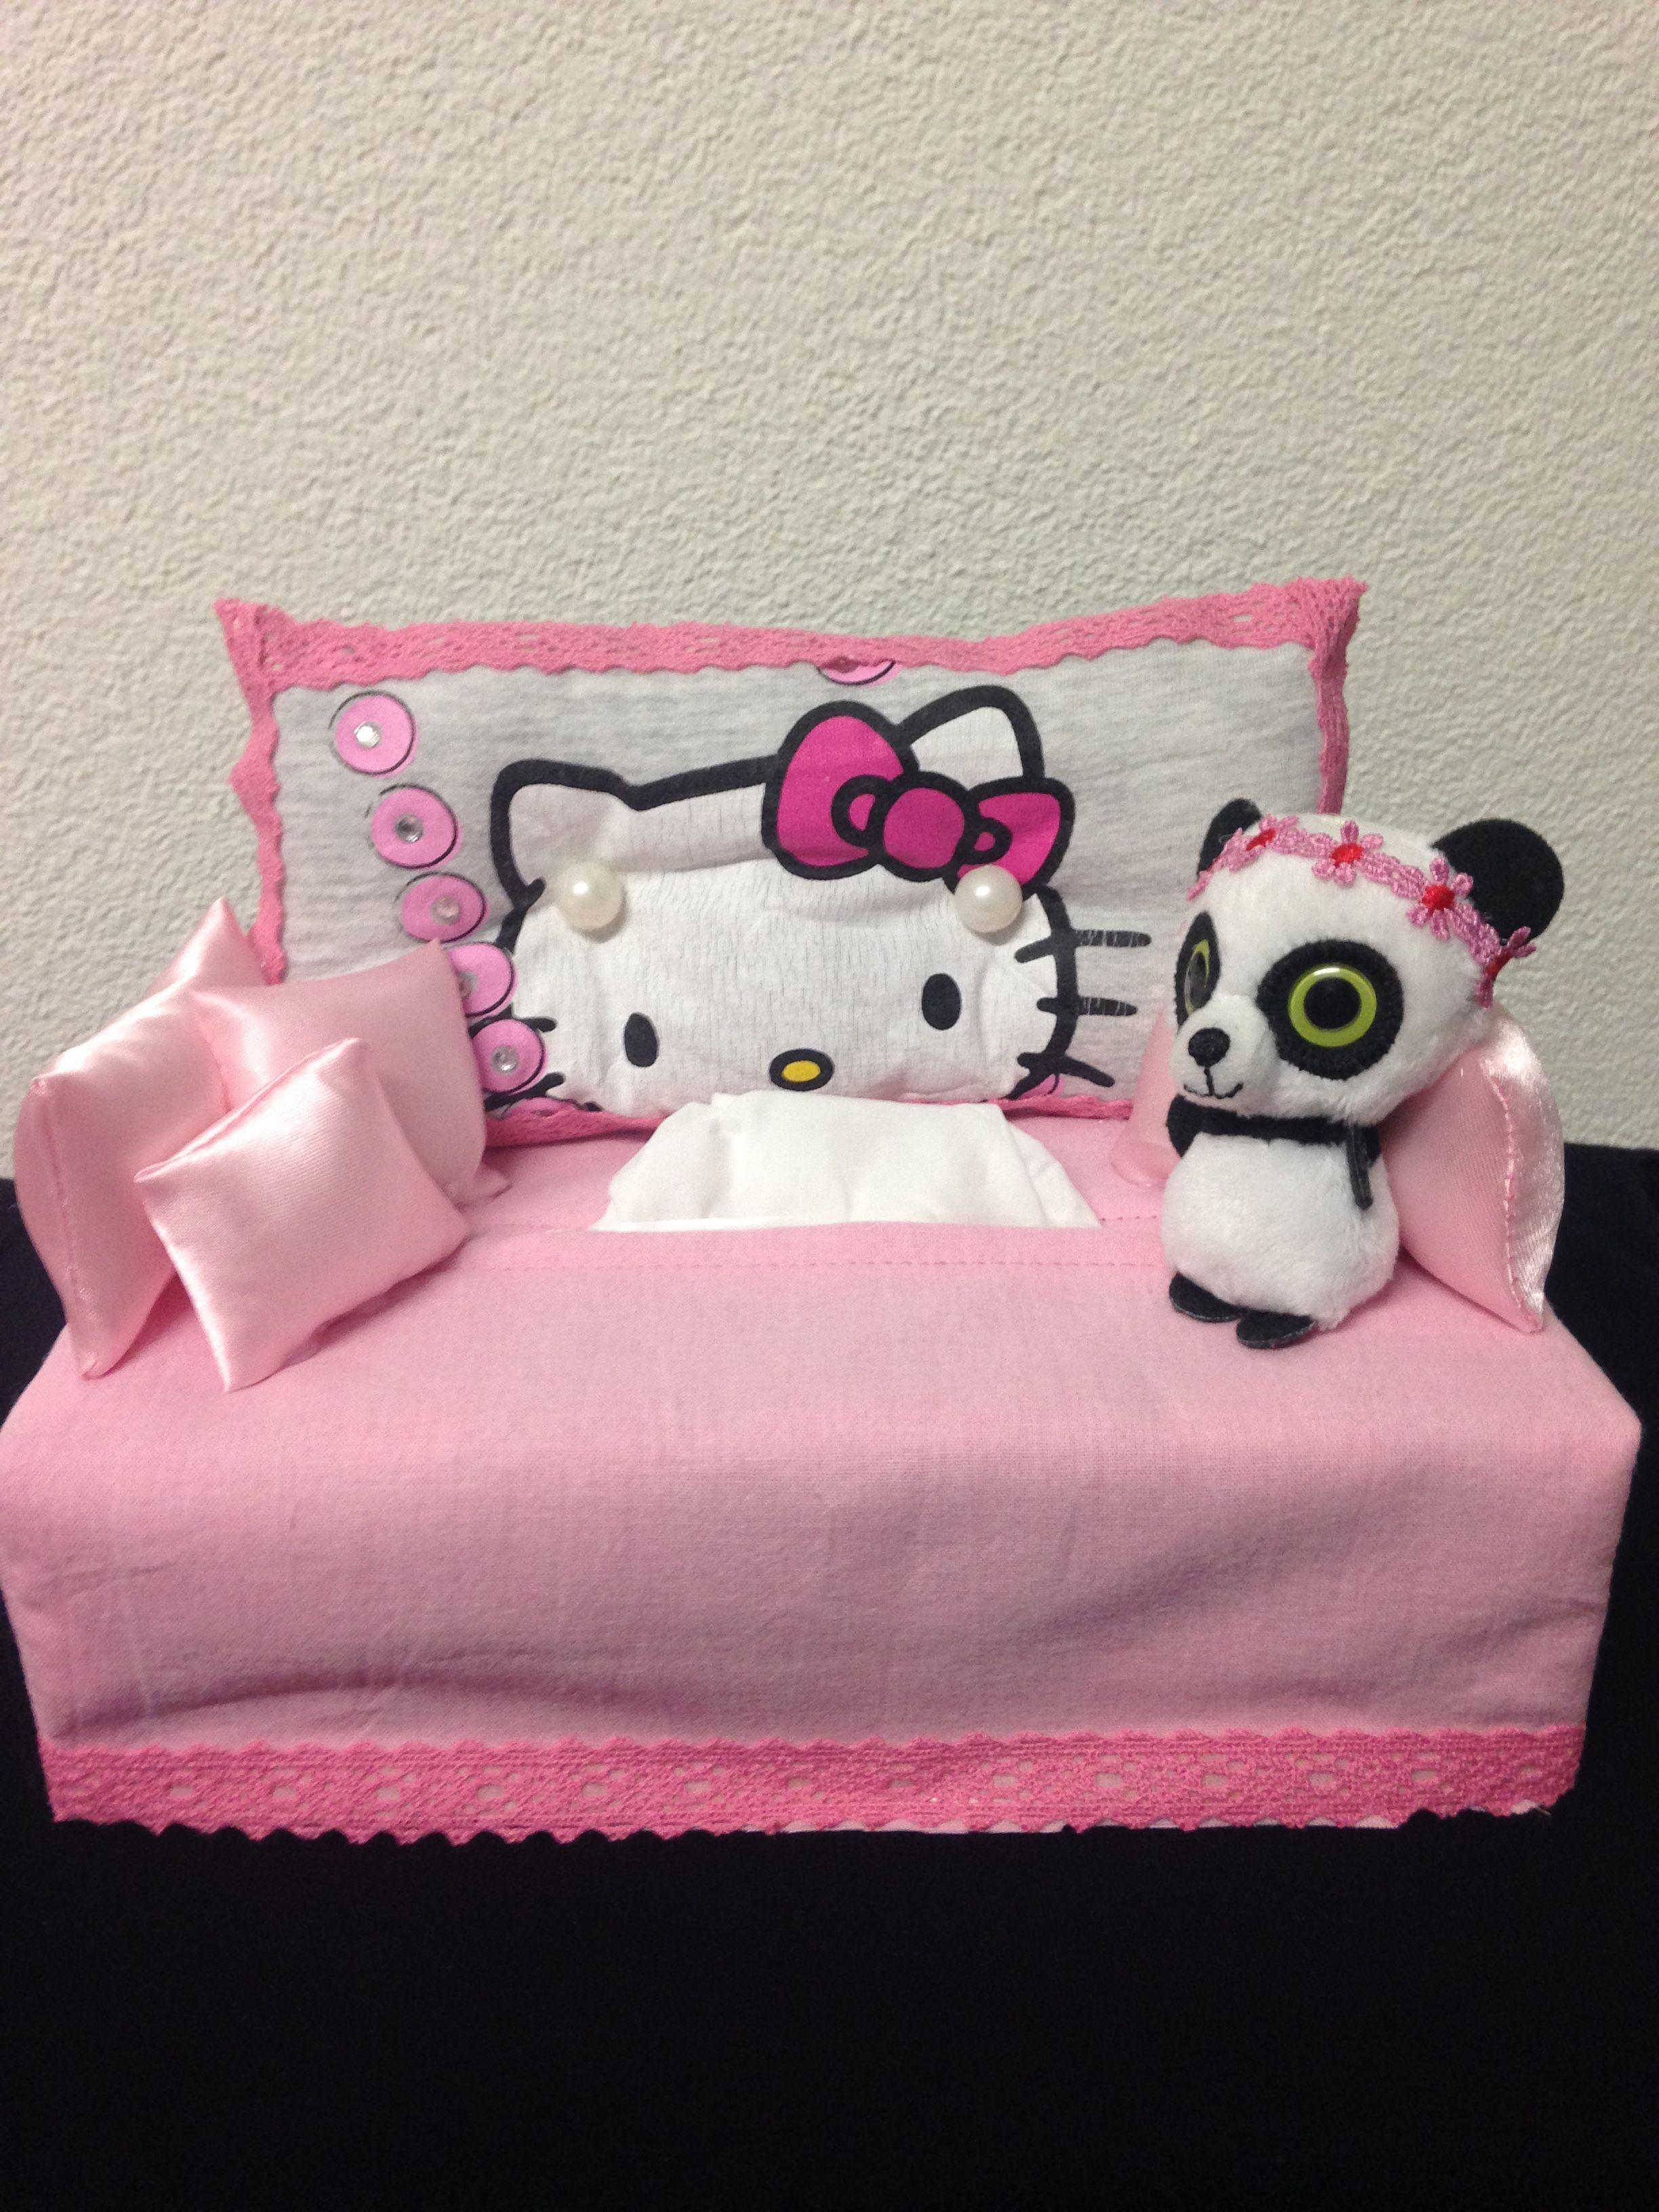 Copriletto Trapuntato Hello Kitty.Divano Hello Kitty Portakleenex Manualidades Para Cajas De Clinex